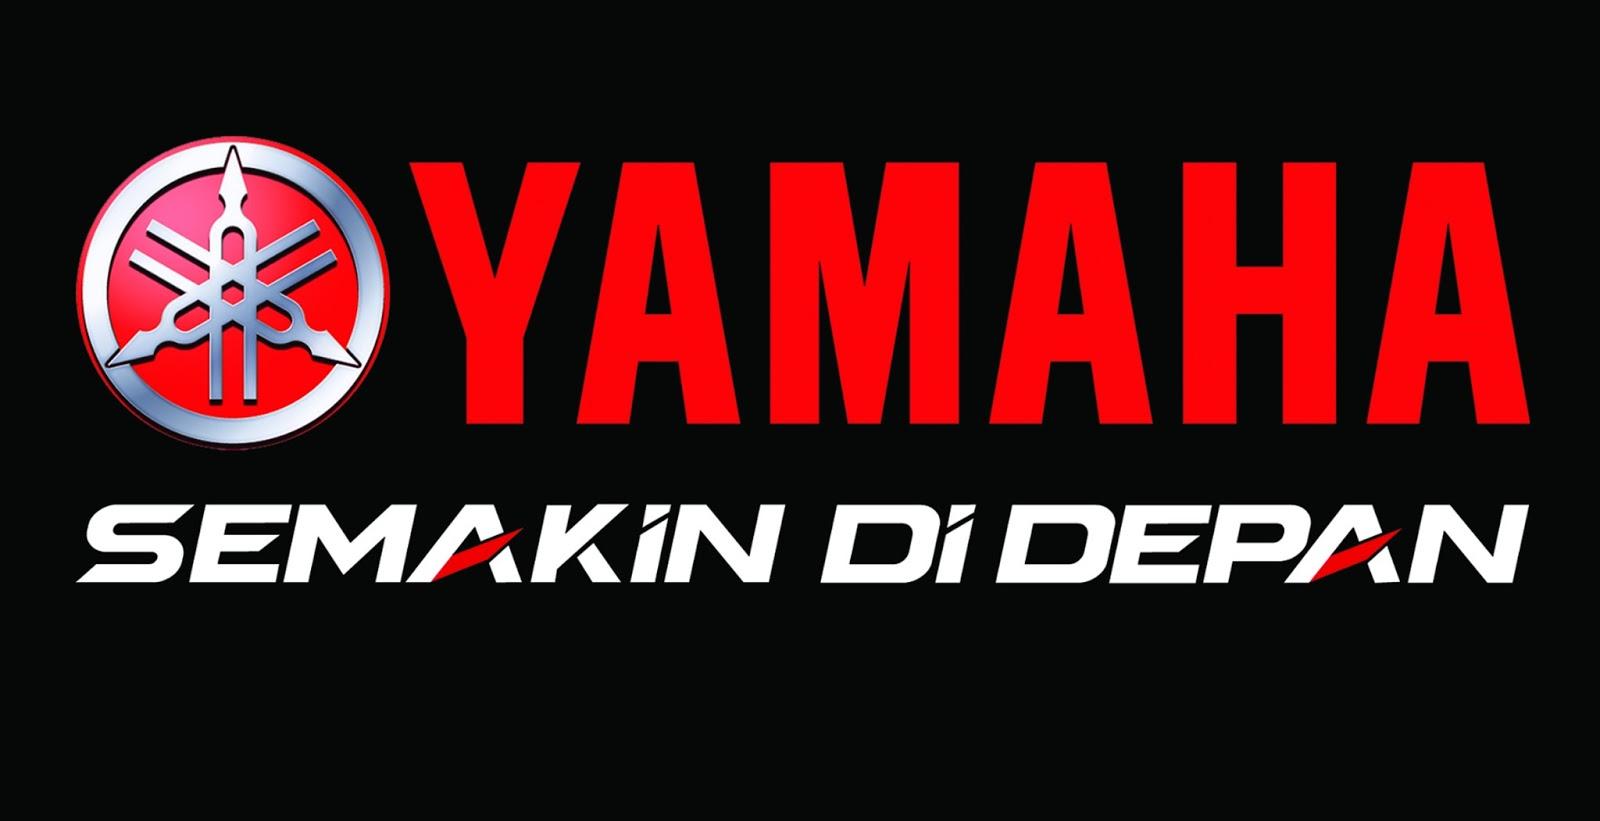 Logo yamaha motor indonesia for Yamaha motor finance usa